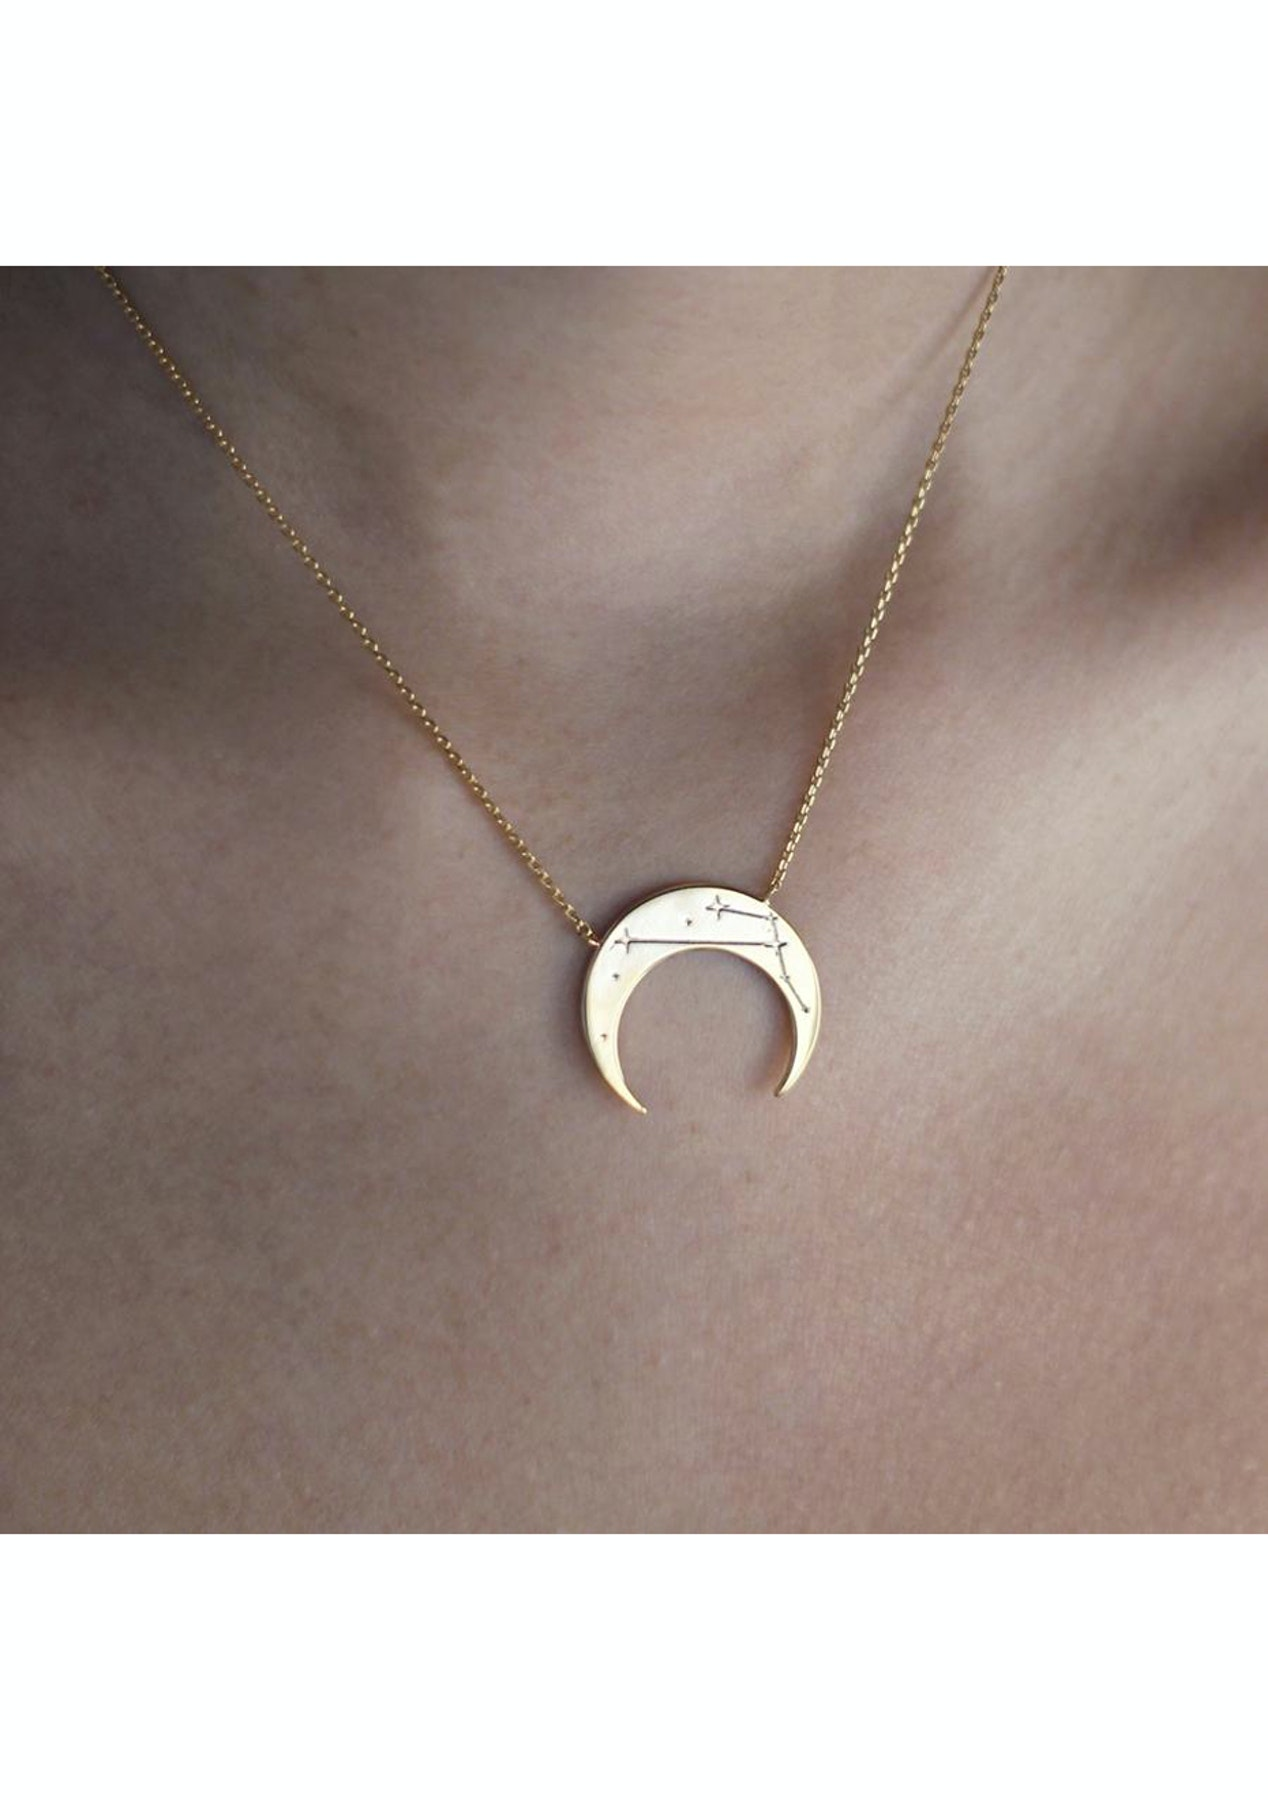 122d3e018376c8 Wanderlust + Co - Crescent Taurus Zodiac Gold Necklace - Wanderlust + Co.  Clearance - Onceit